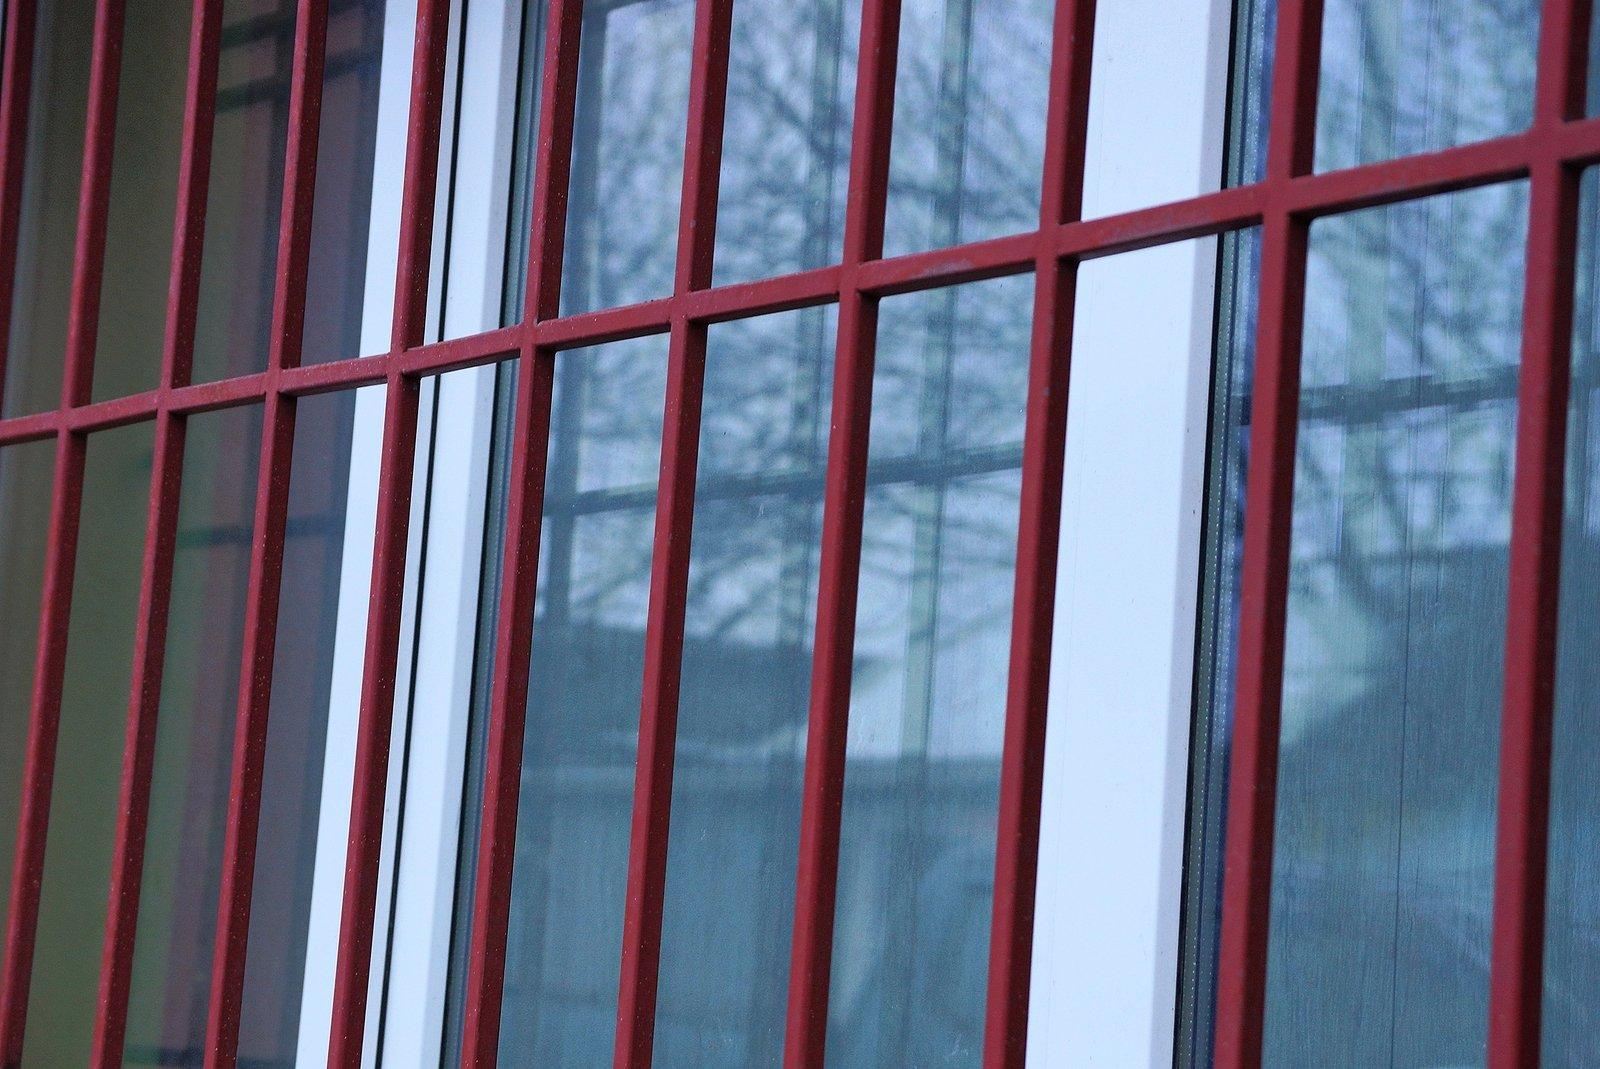 window-security-bars-renaissance-development-dc